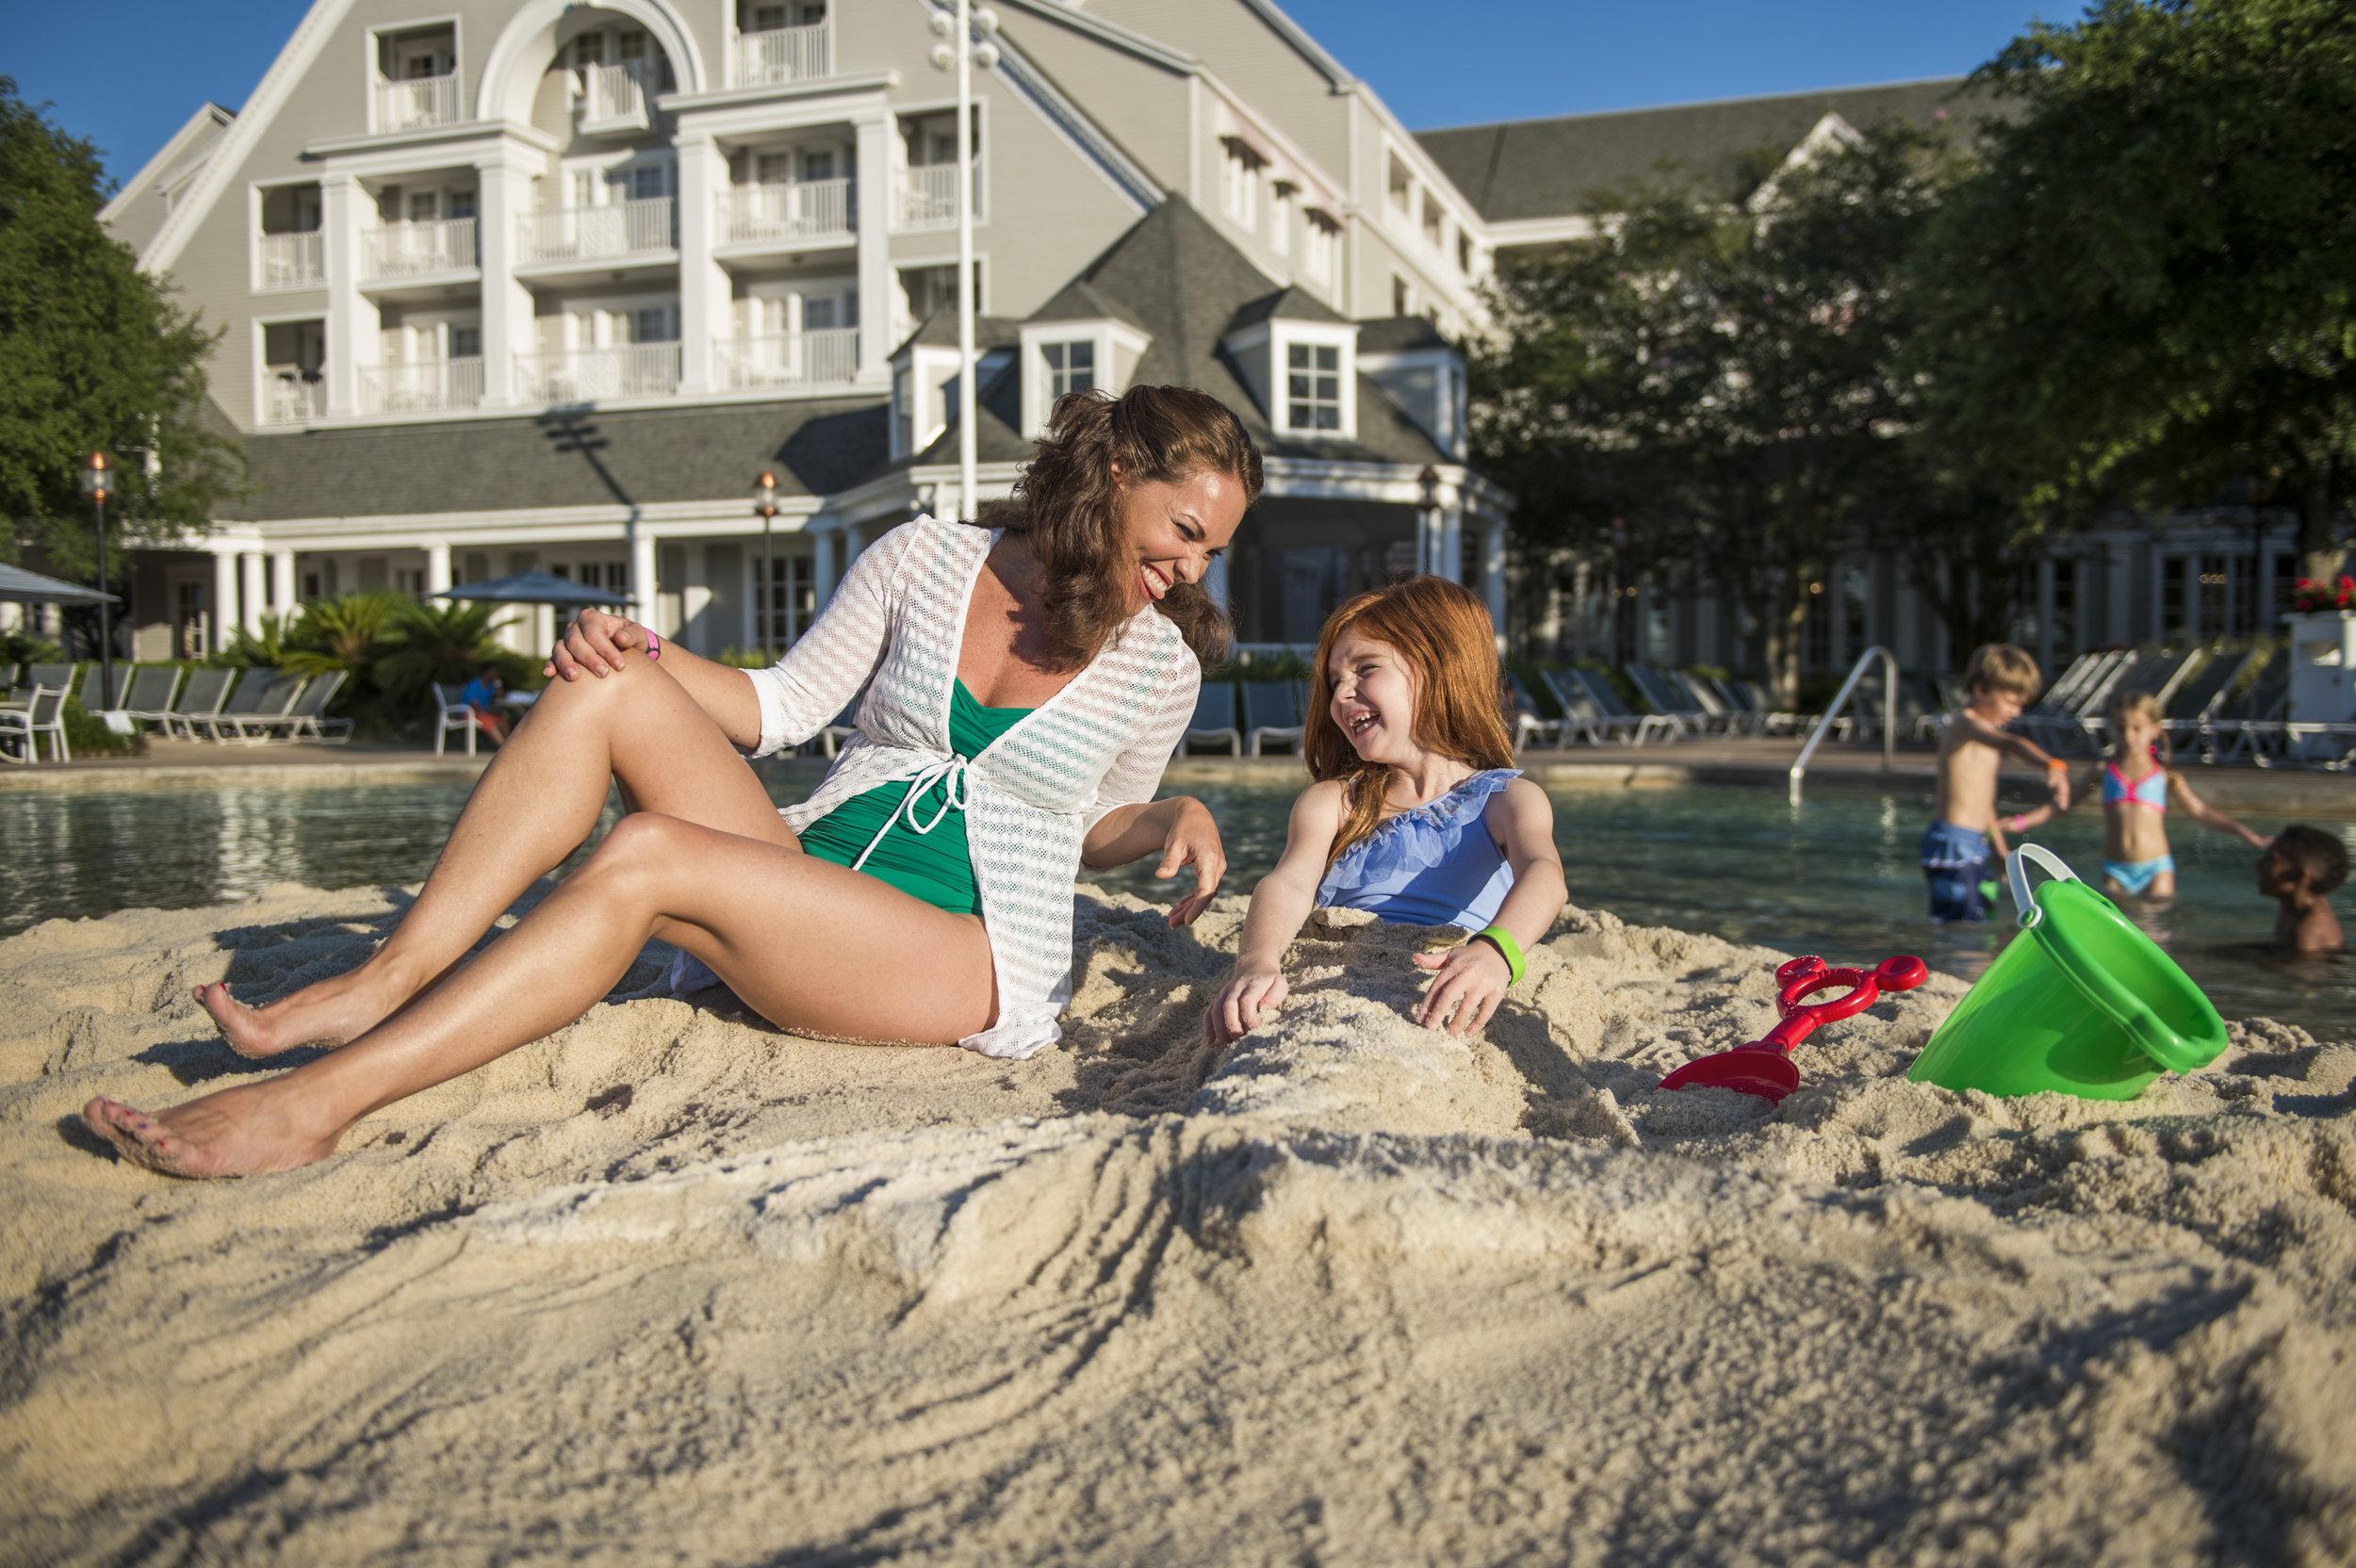 Disney's Beach Club Resort - Deluxe accommodations near Epcot